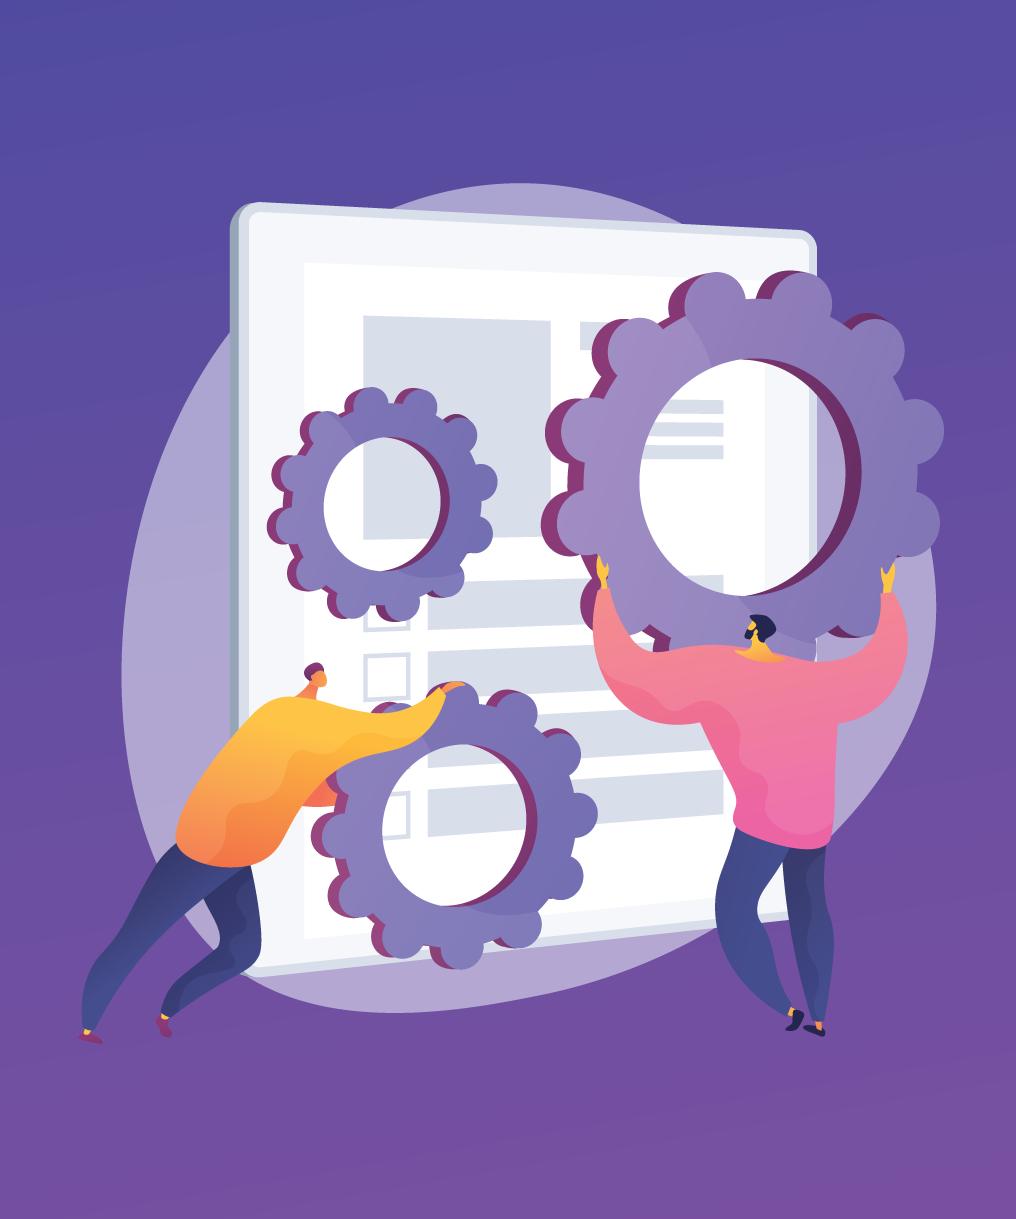 Application Enhancements, Performance enhancements, App upgrades, support and maintenance, BizTecno, software development company, web development company